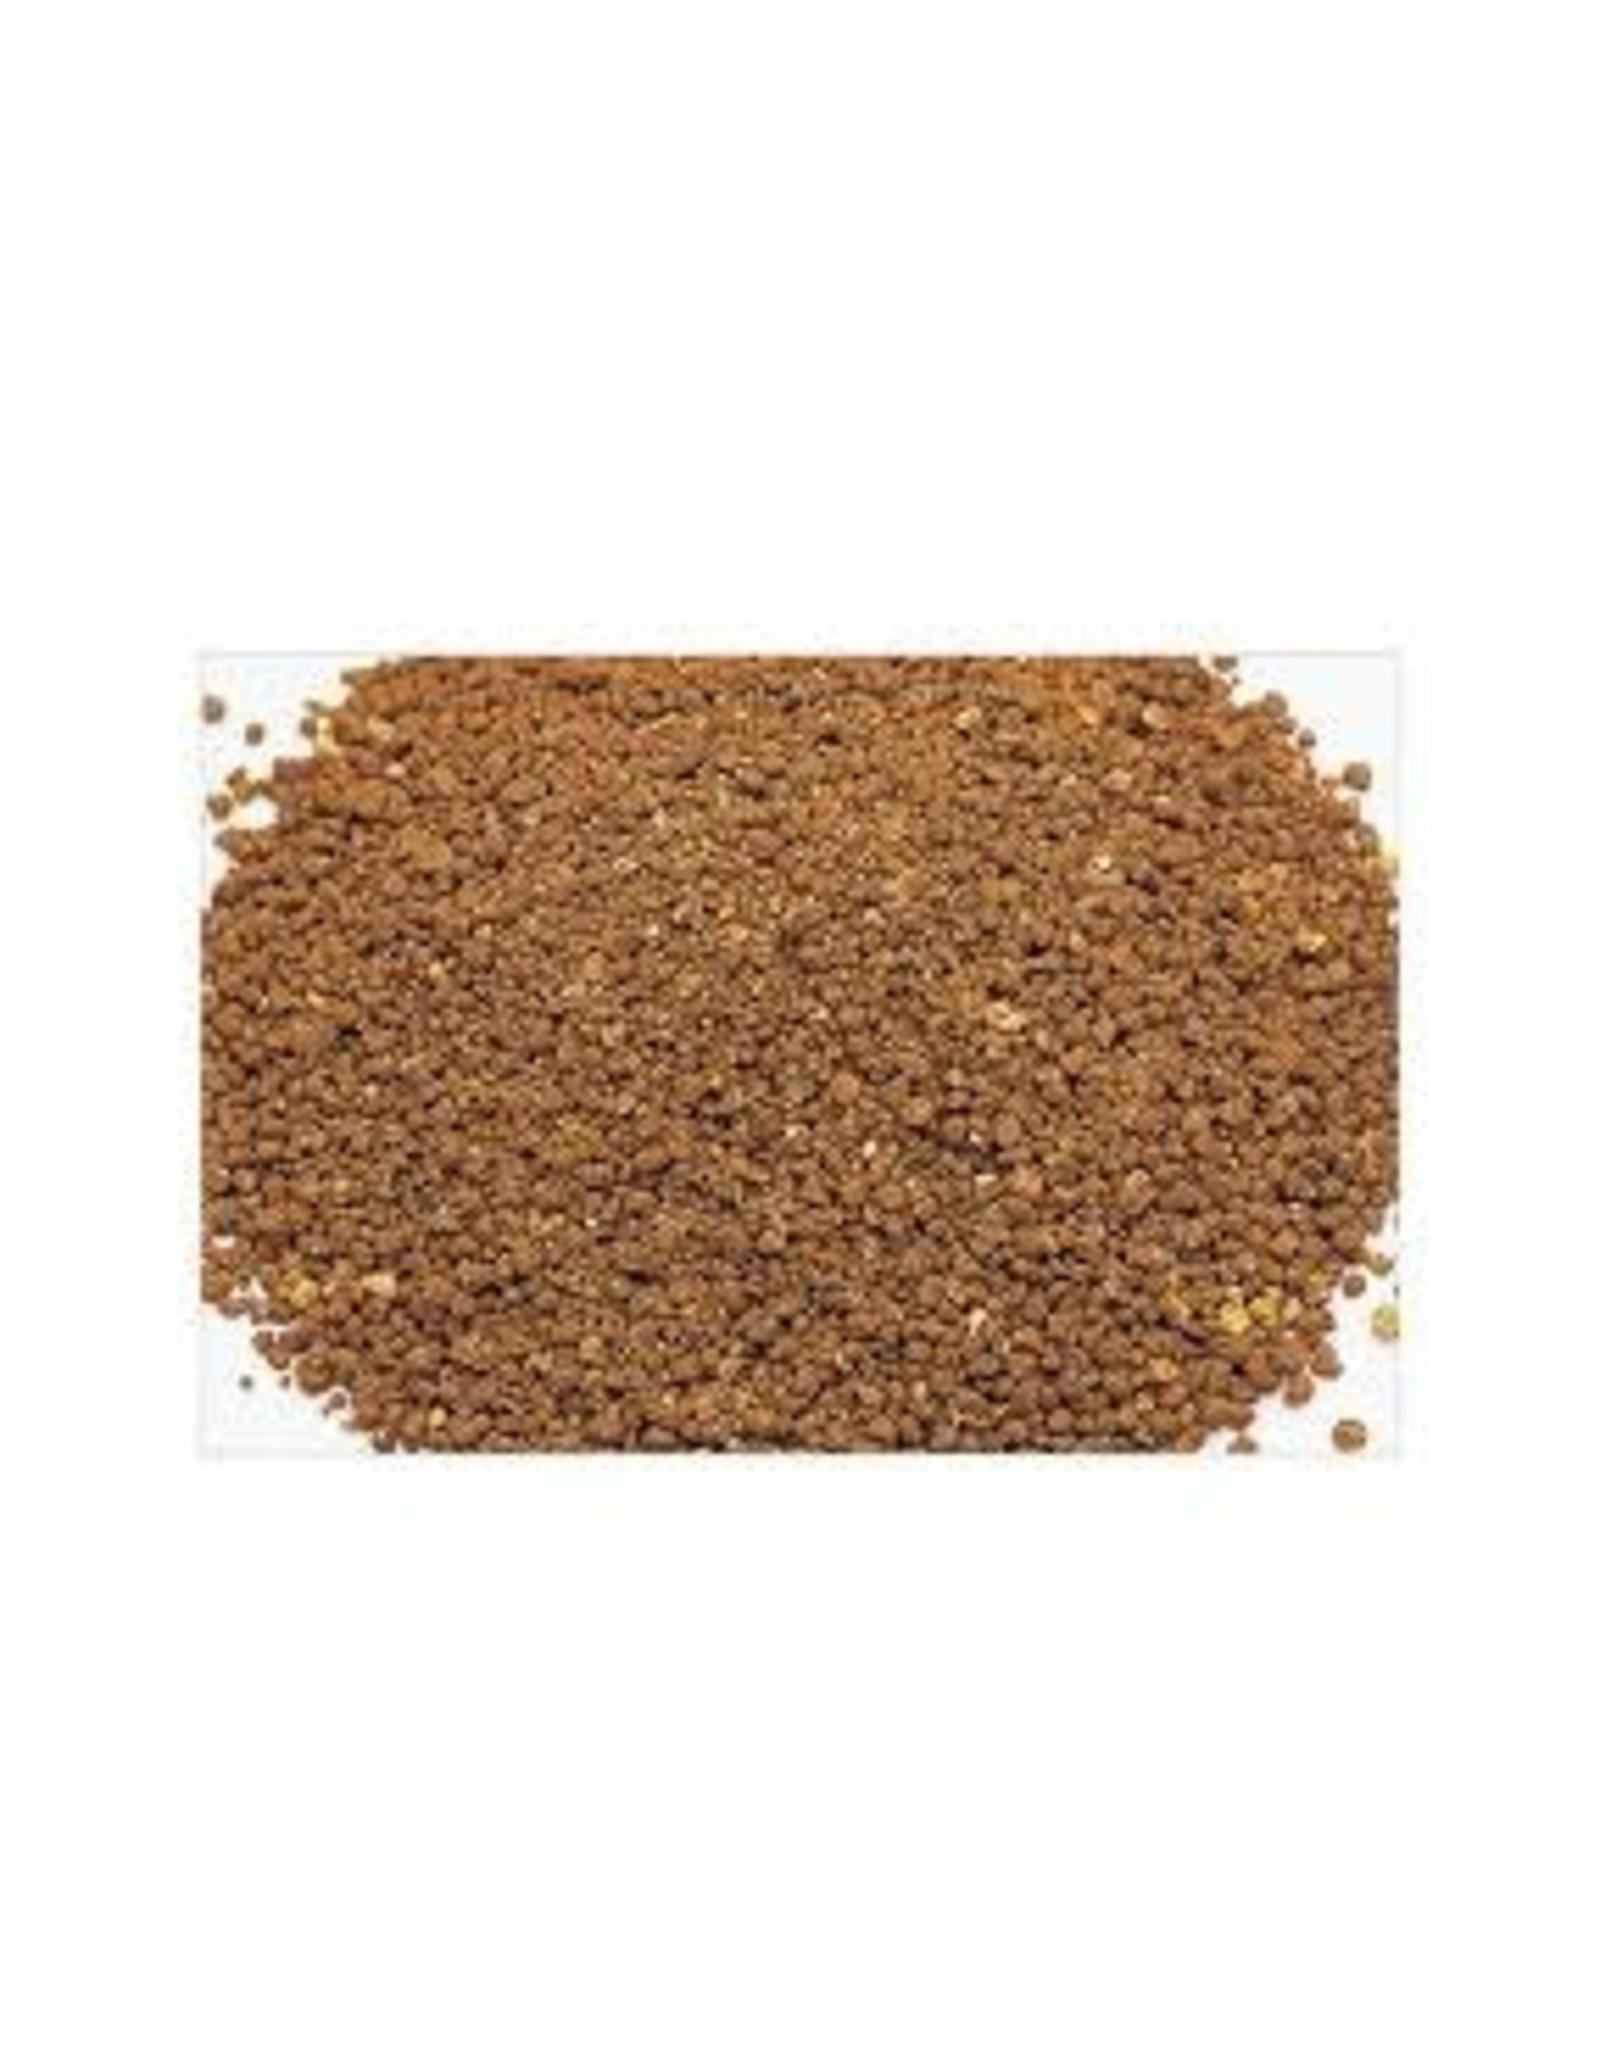 ADA ADA Aqua Soil Powder -  Malaya 9L